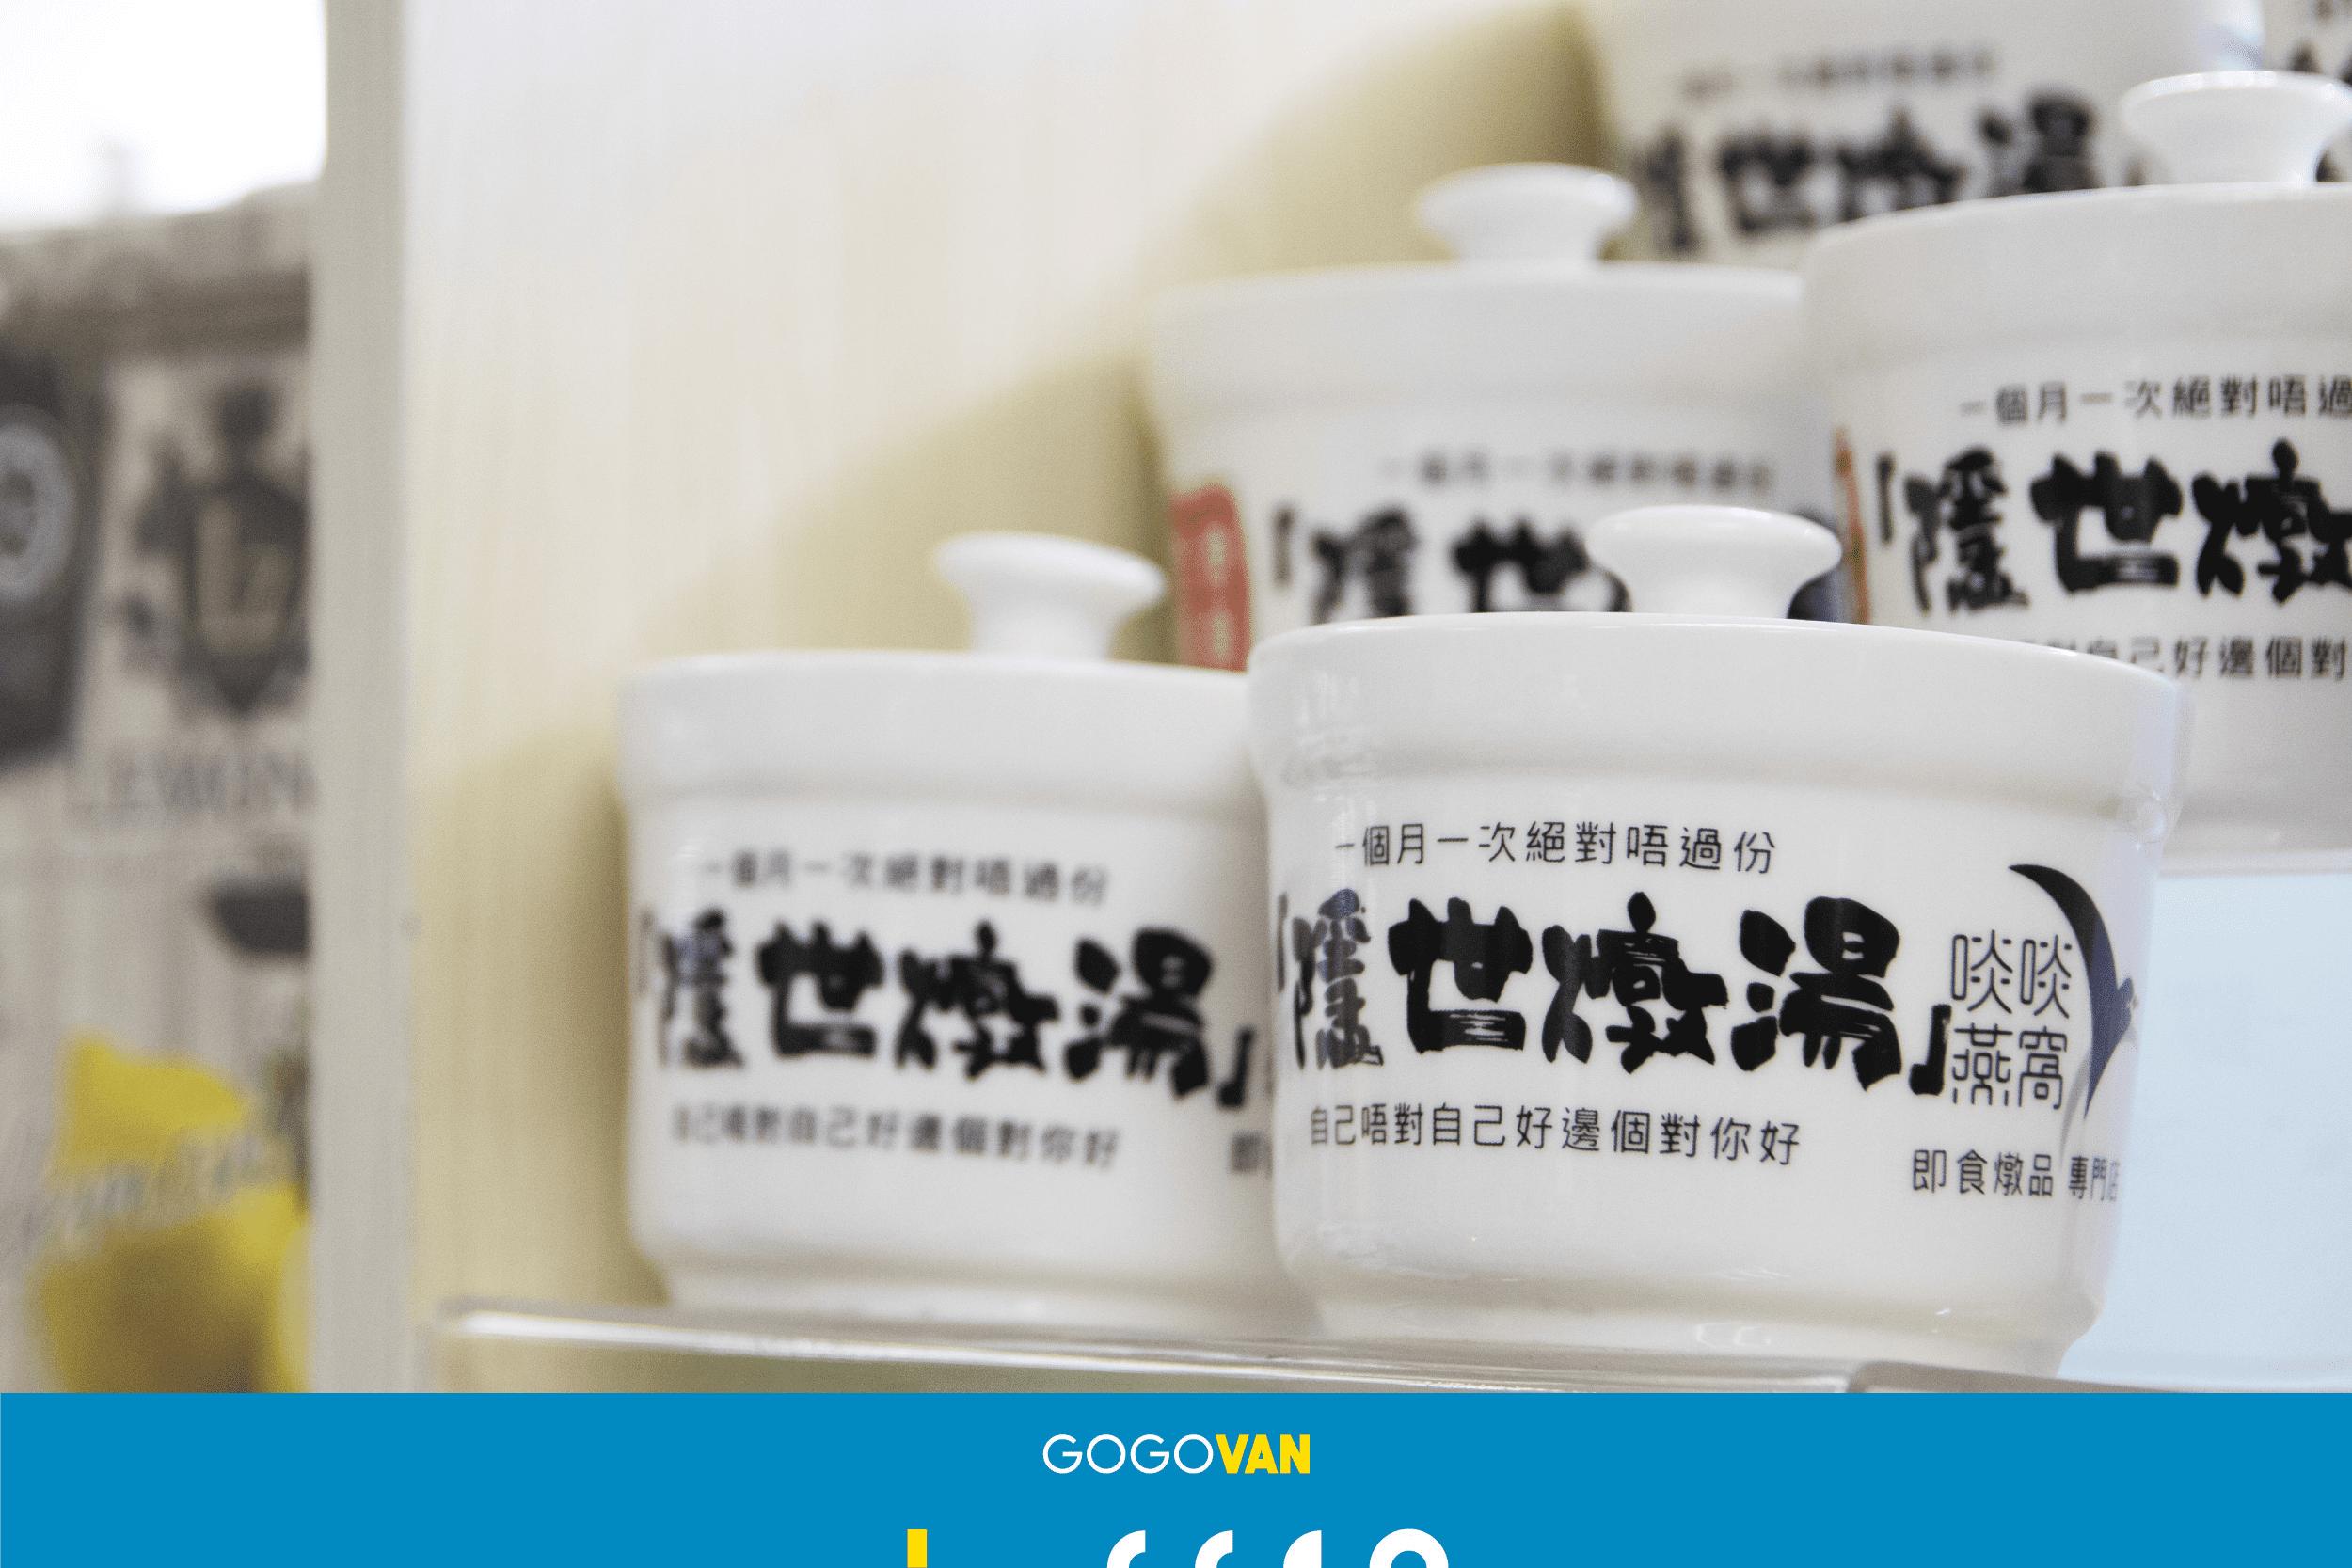 【GOGODelivery 】客戶分享 – 啖啖燕窩花膠燉湯專門店